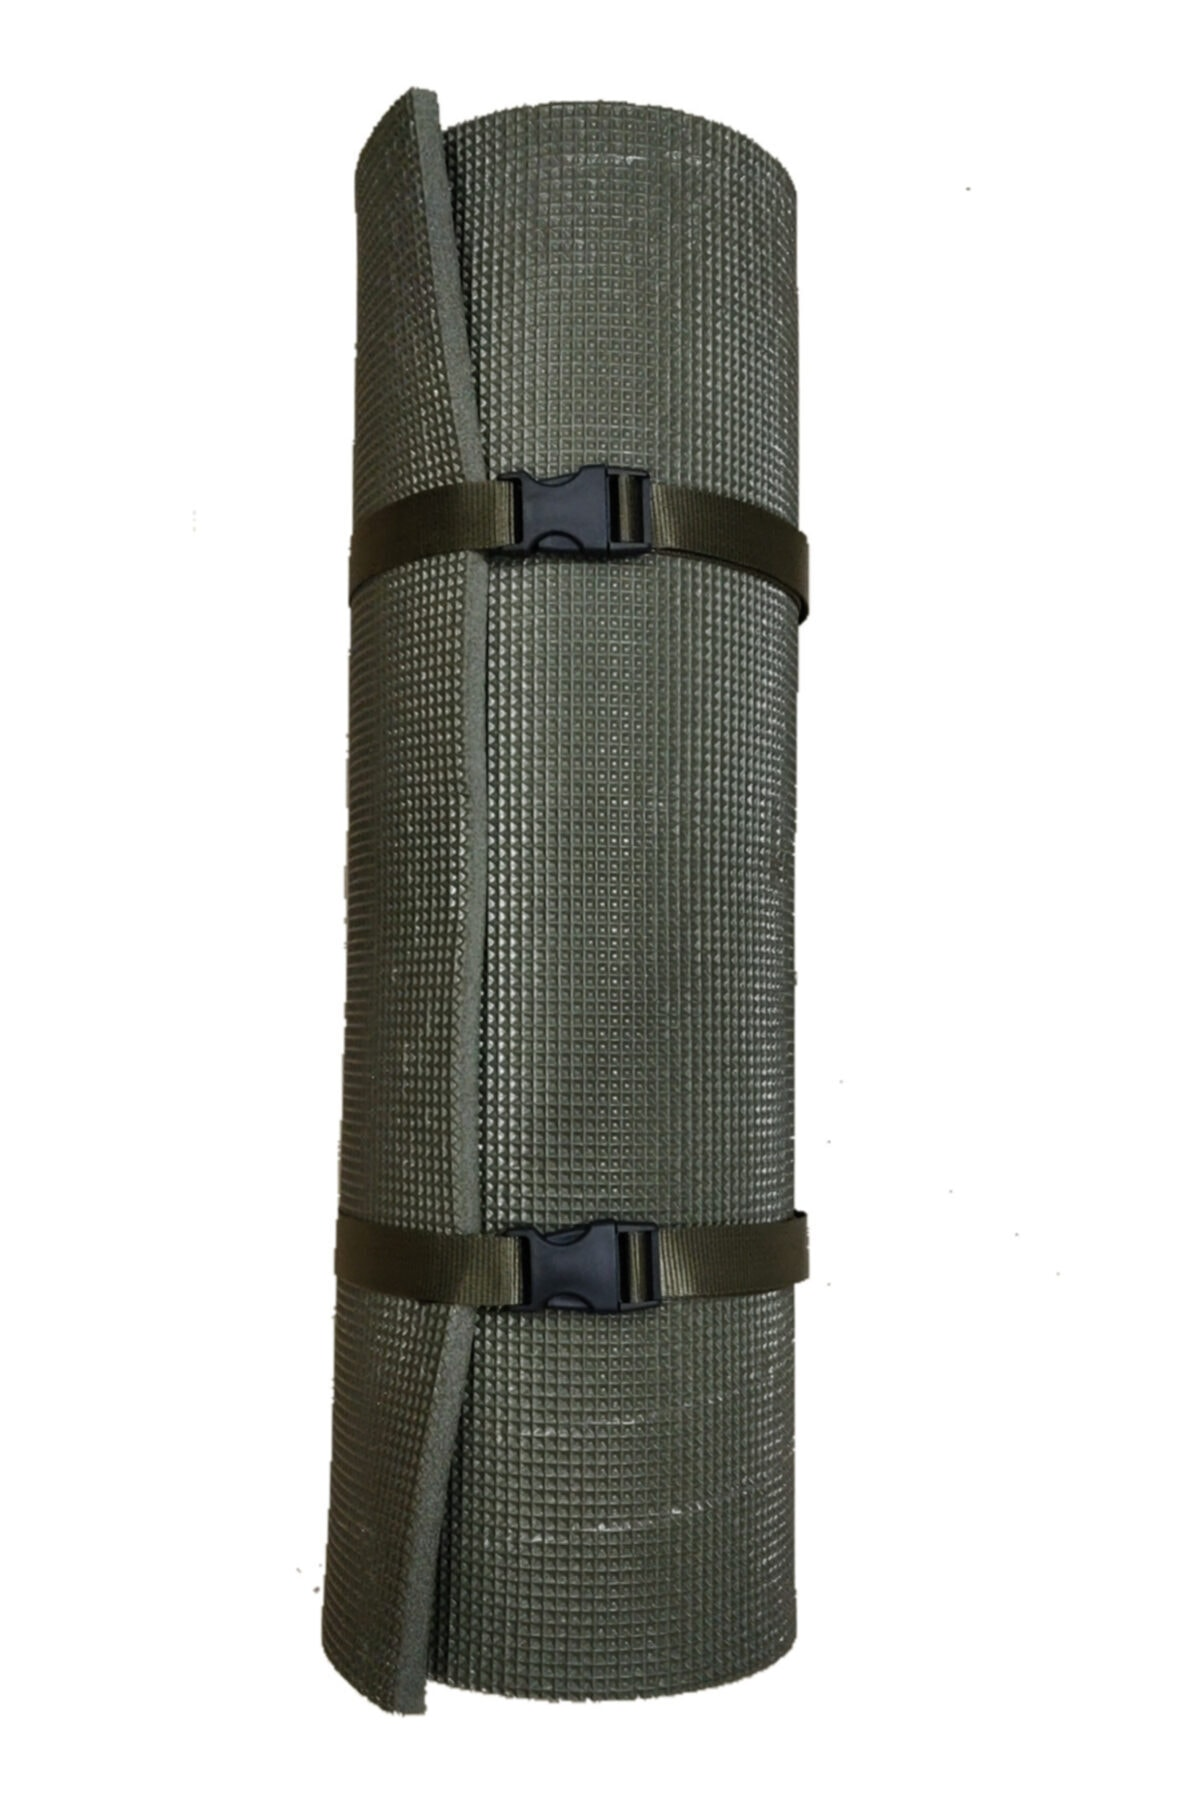 Accord Askeri Kamp Matı Kamp Çadırına Uygun 60x190/10mm